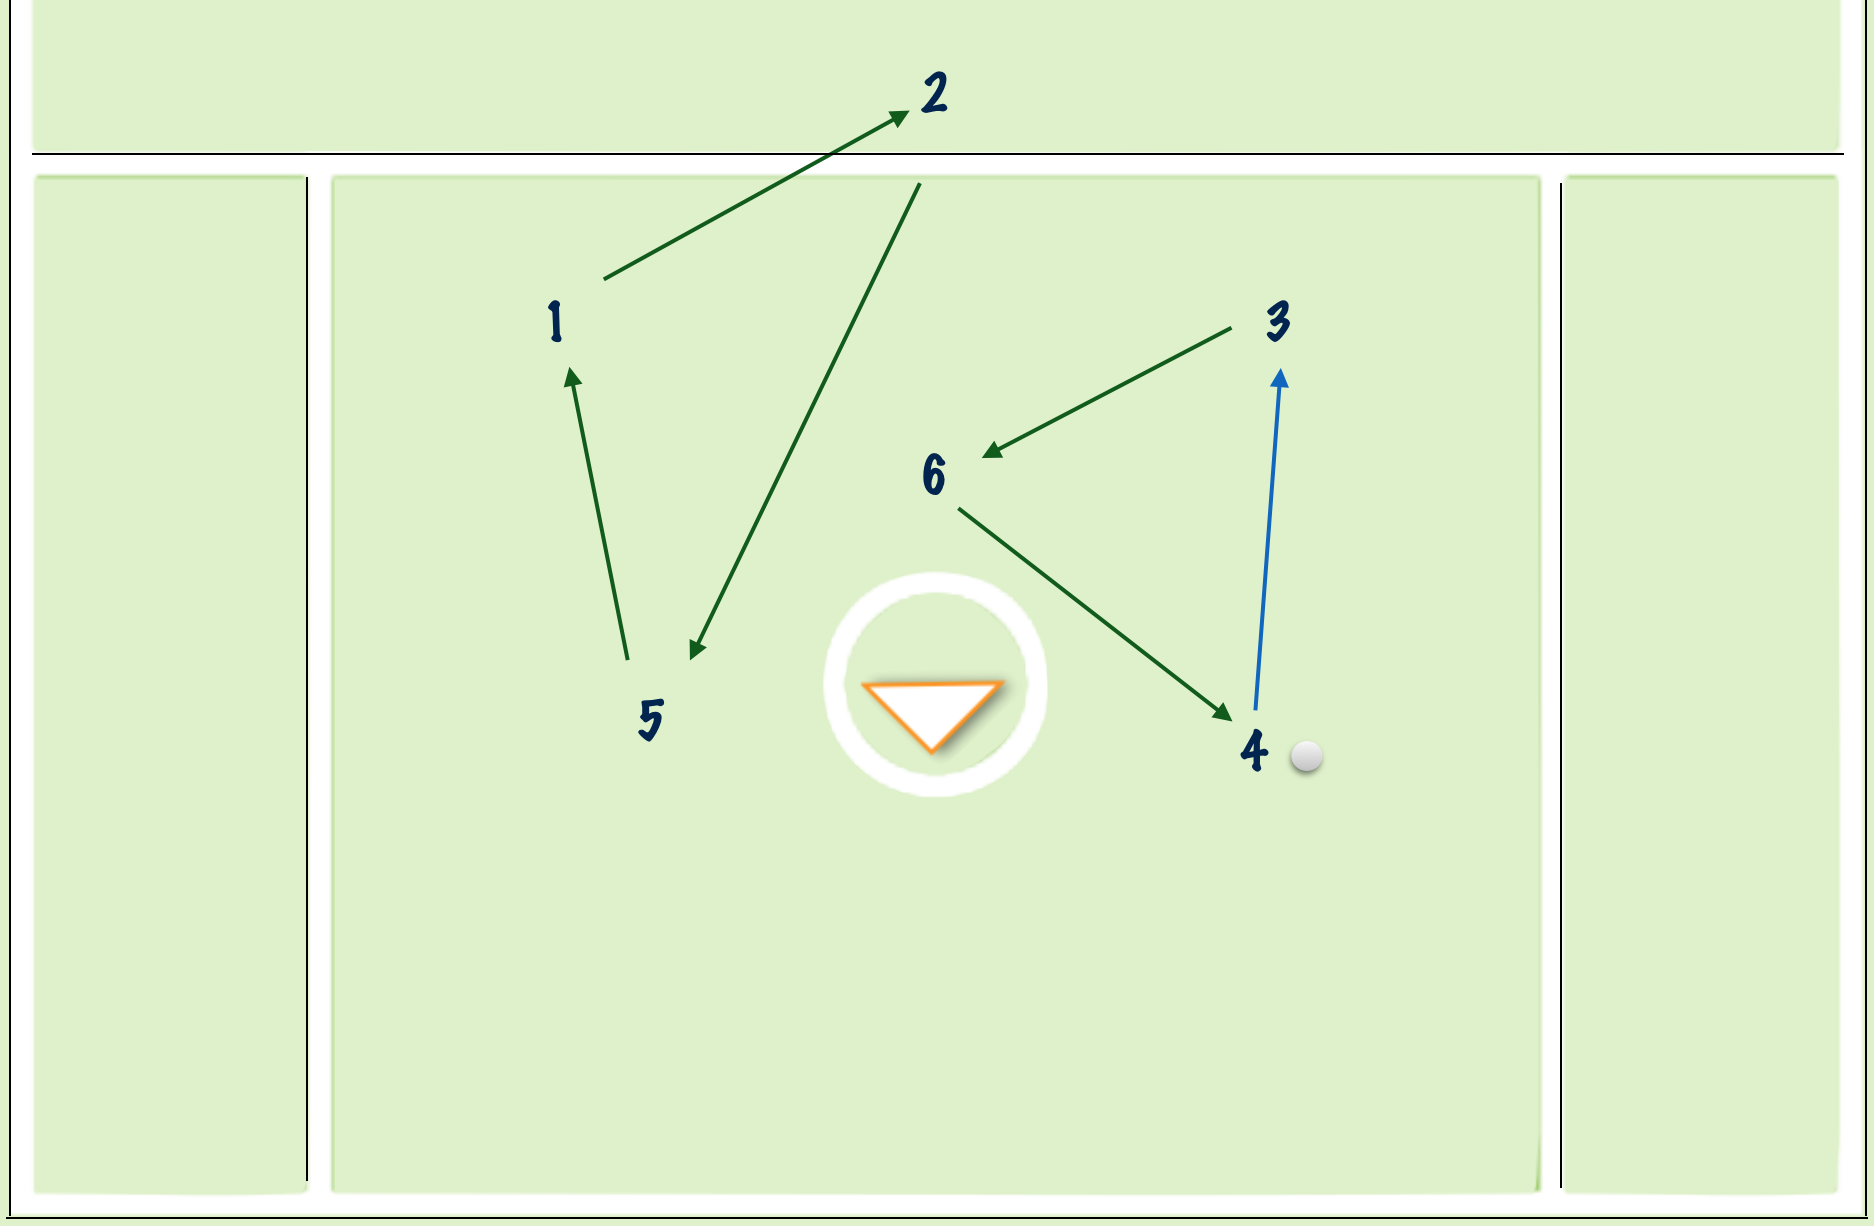 1-3-2 Side Triangle Carry